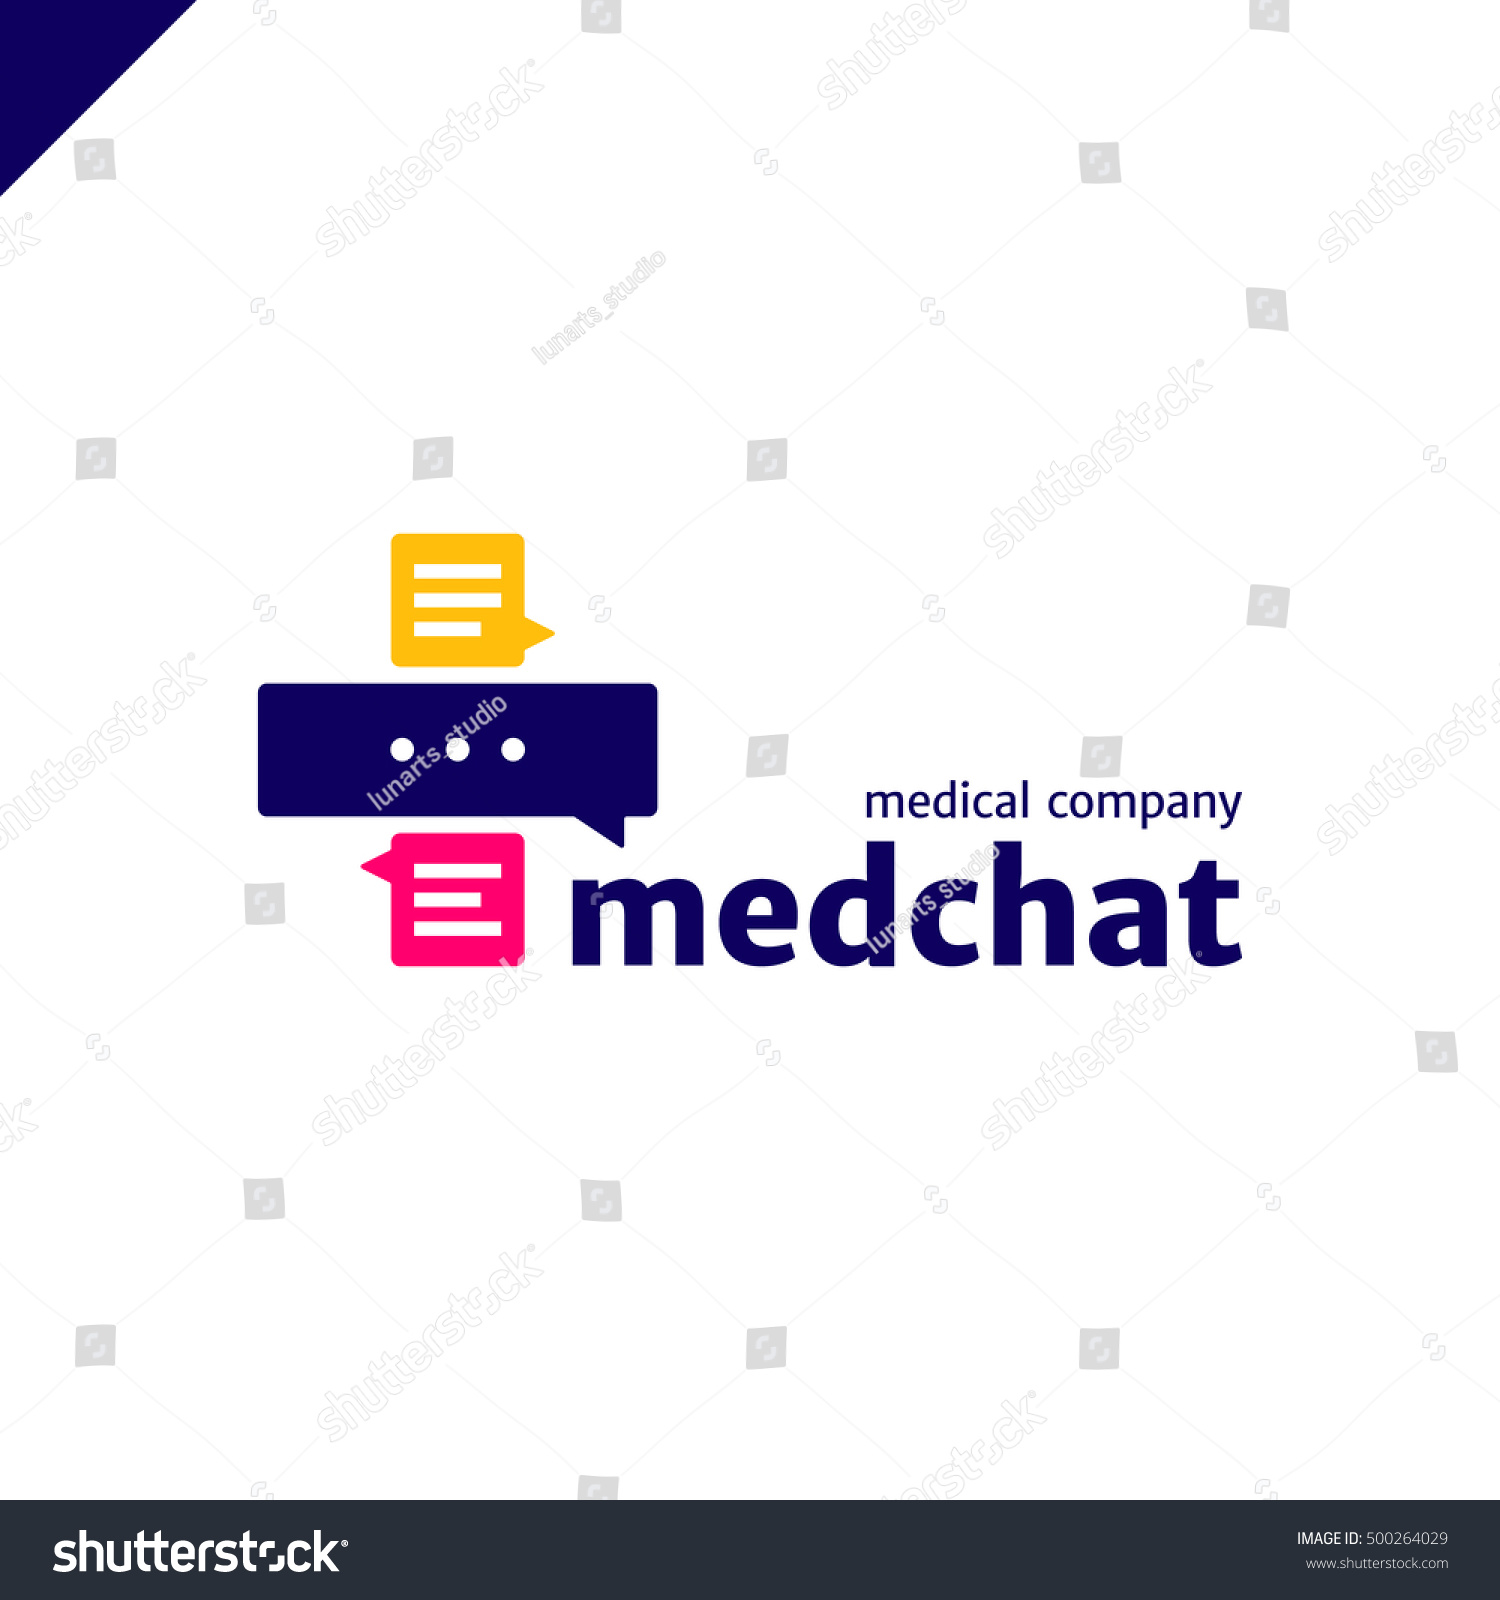 Medical cross health care talk logo stock vector 500264029 medical cross health care talk logo stock vector 500264029 shutterstock buycottarizona